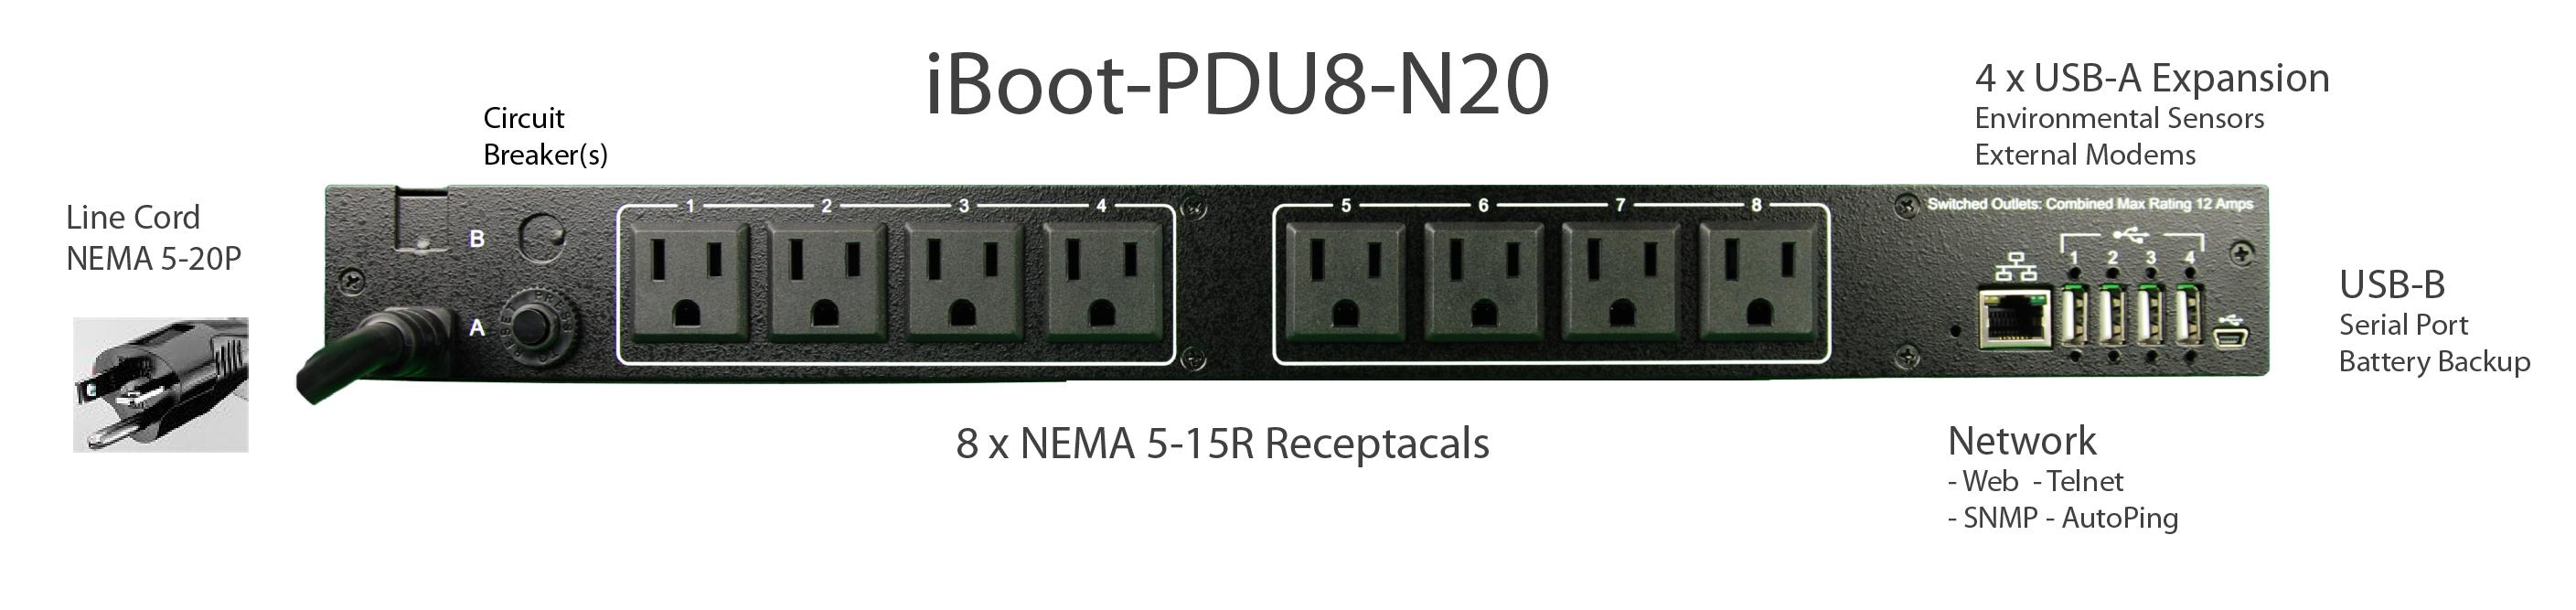 iBoot-PDU8-N20 for Remote Reboot, 1 x NEMA 5-20P.